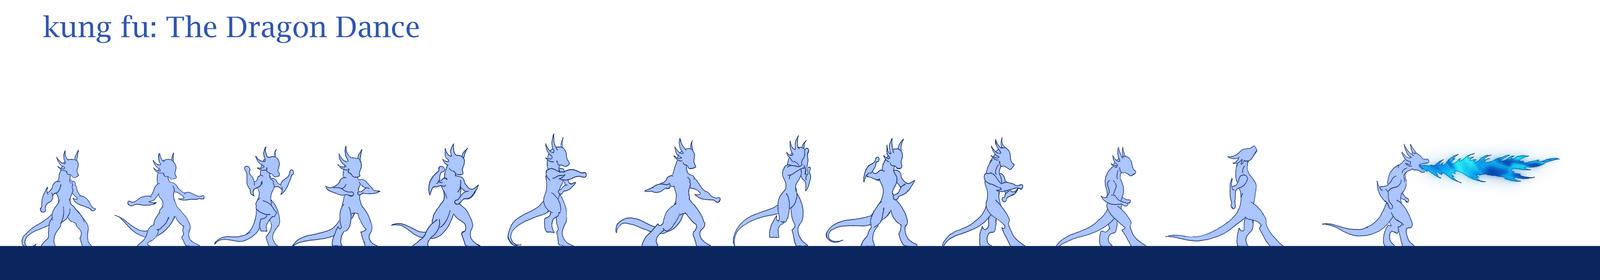 Kaiju: The Dragon Dance [Kung-Fu] by Cyprus-1